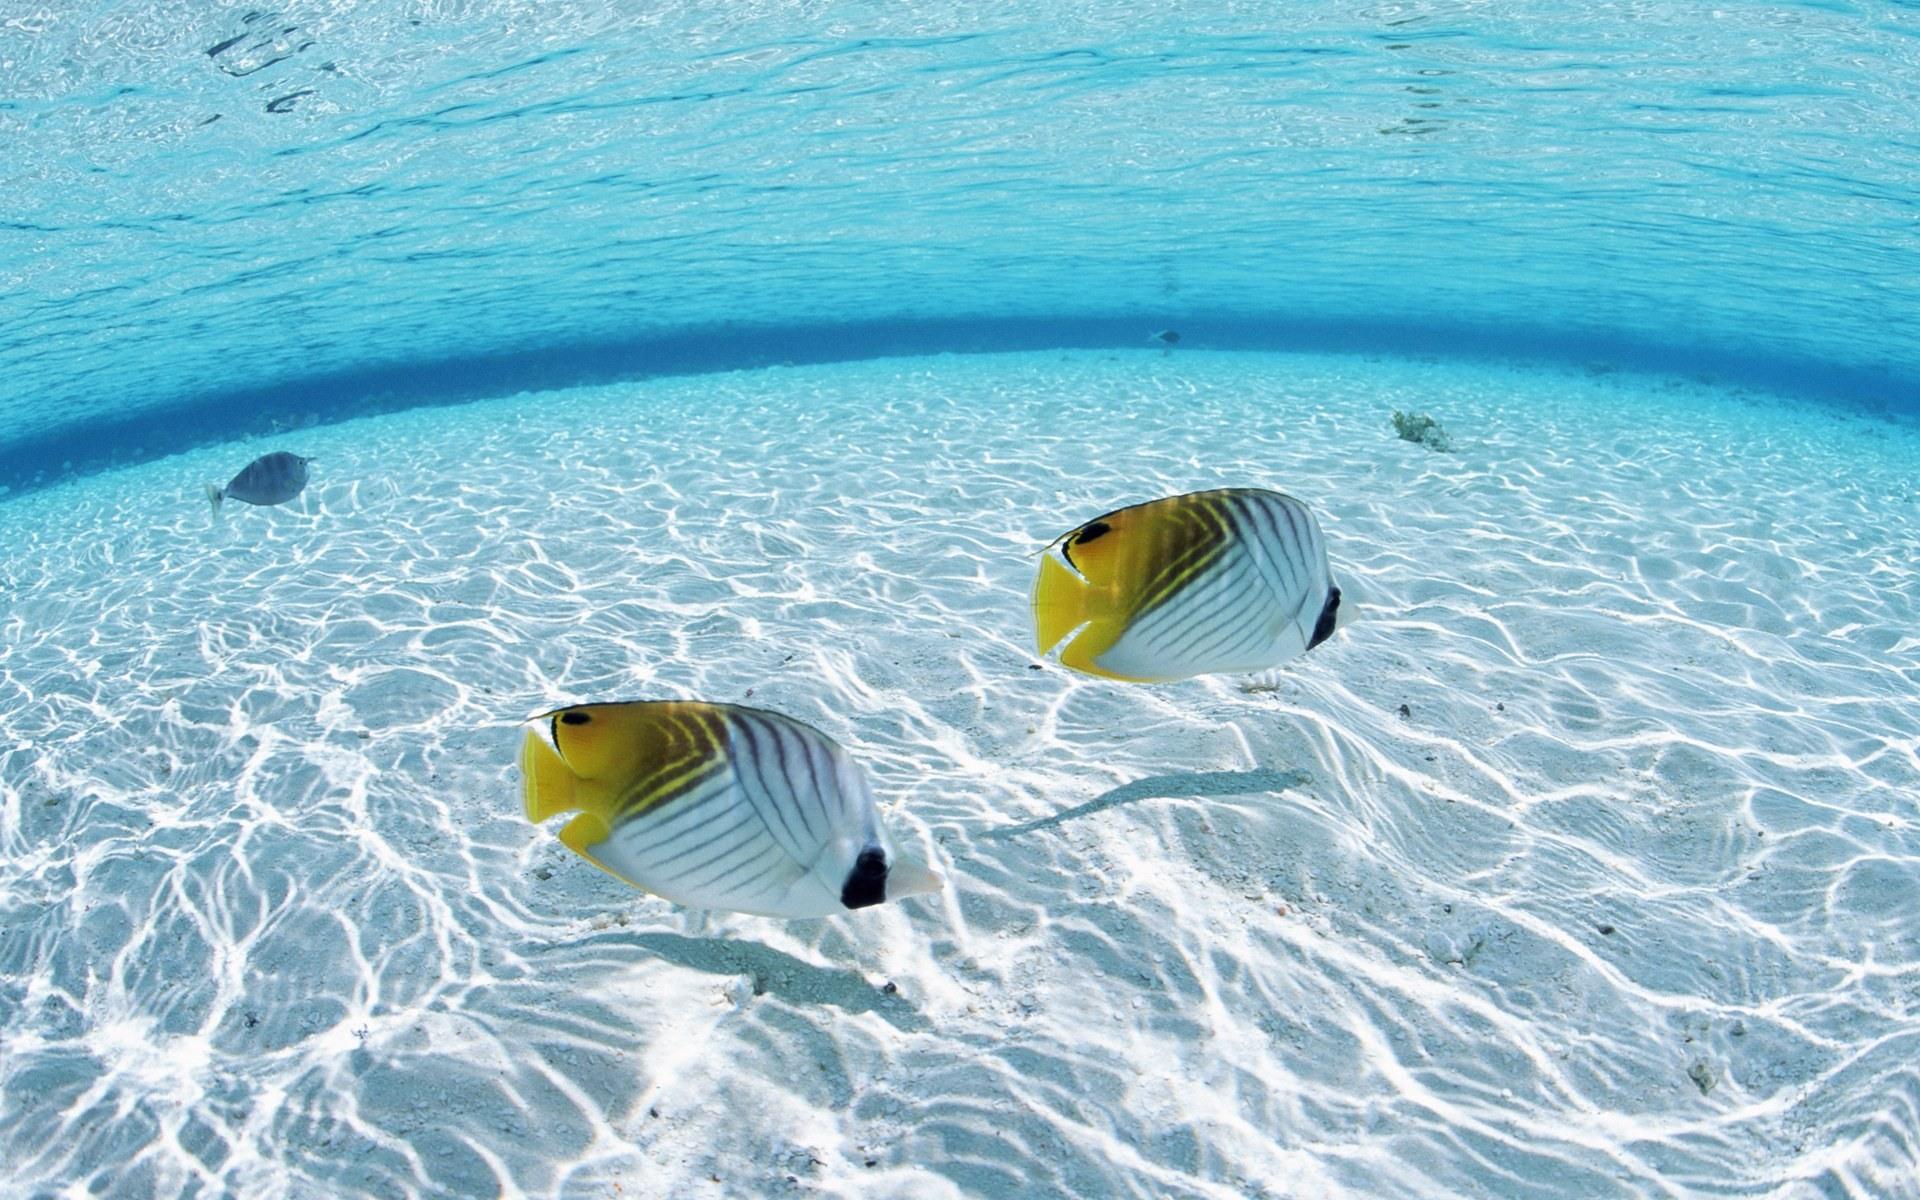 Hd Wallpapers 1080p Ocean: Ocean Wallpaper HD